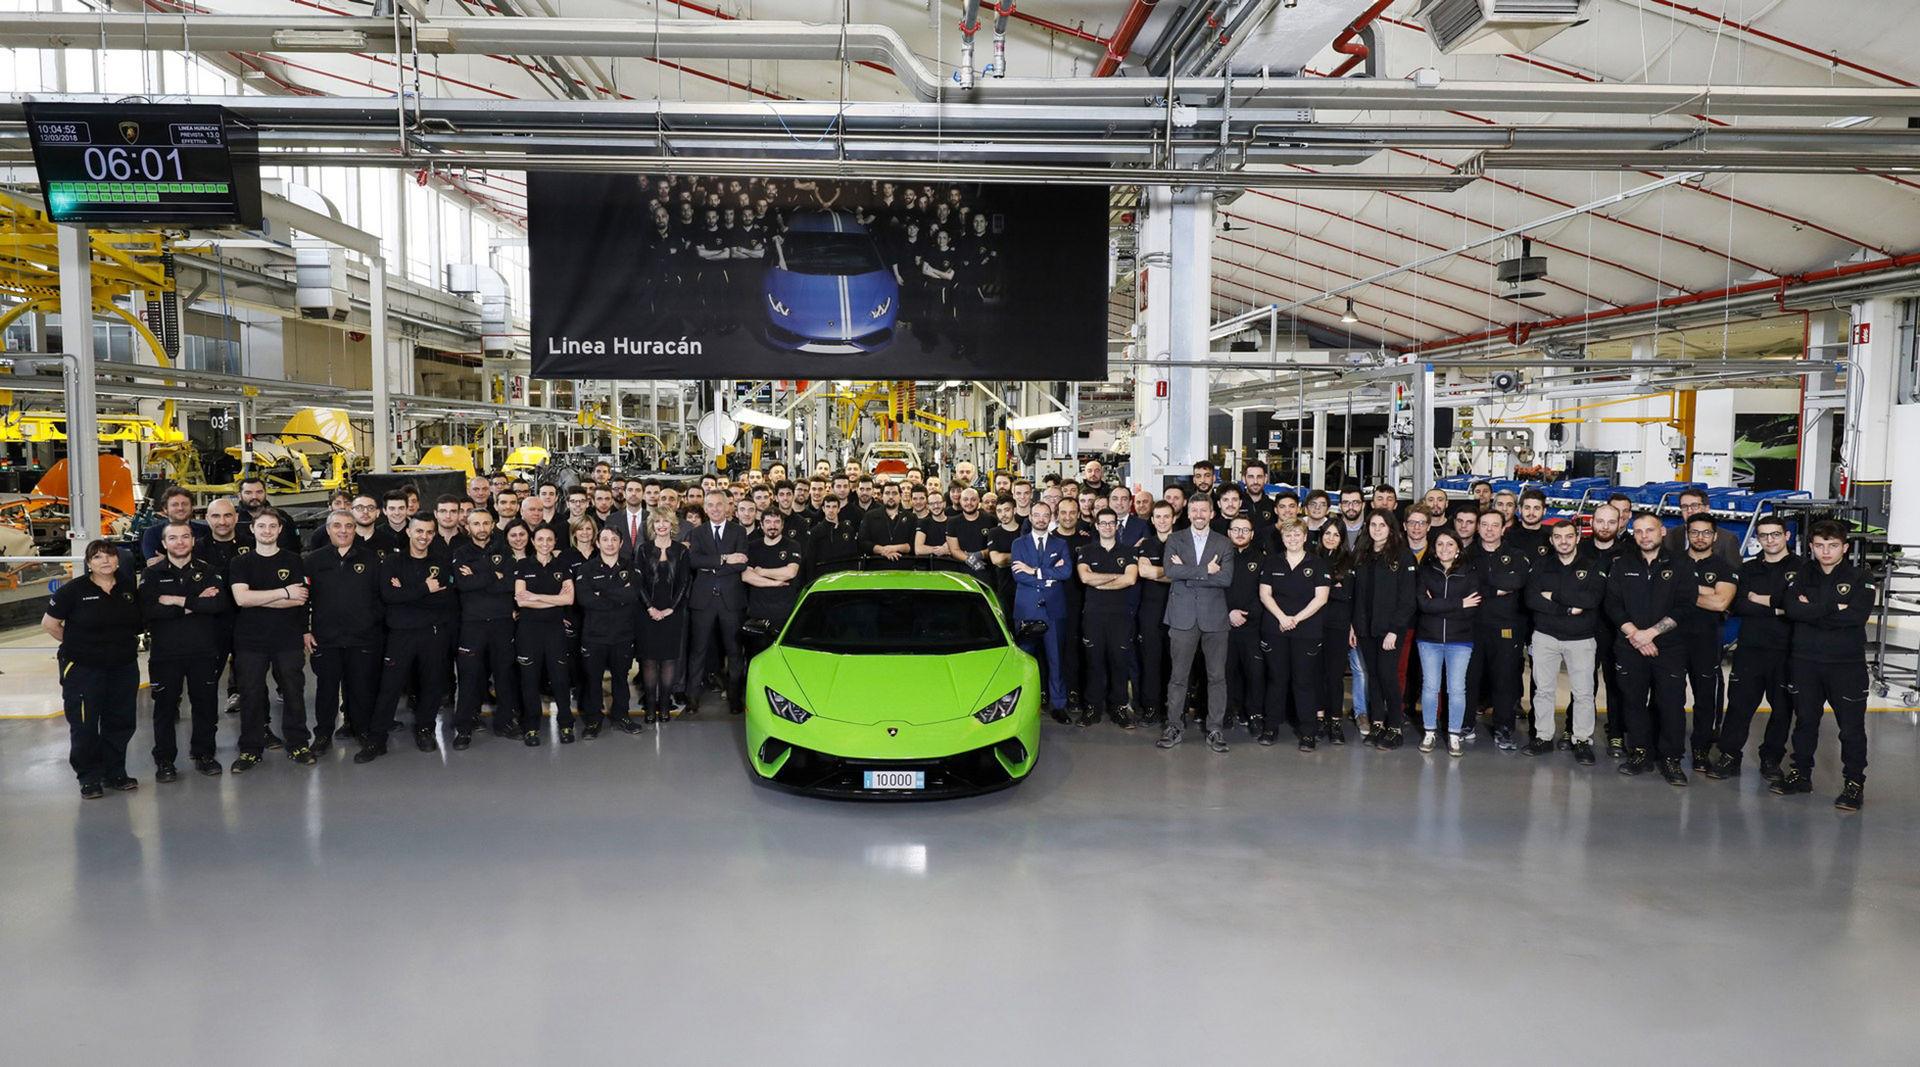 Lamborghini har nu skruvat ihop 10.000 stycken Huracán